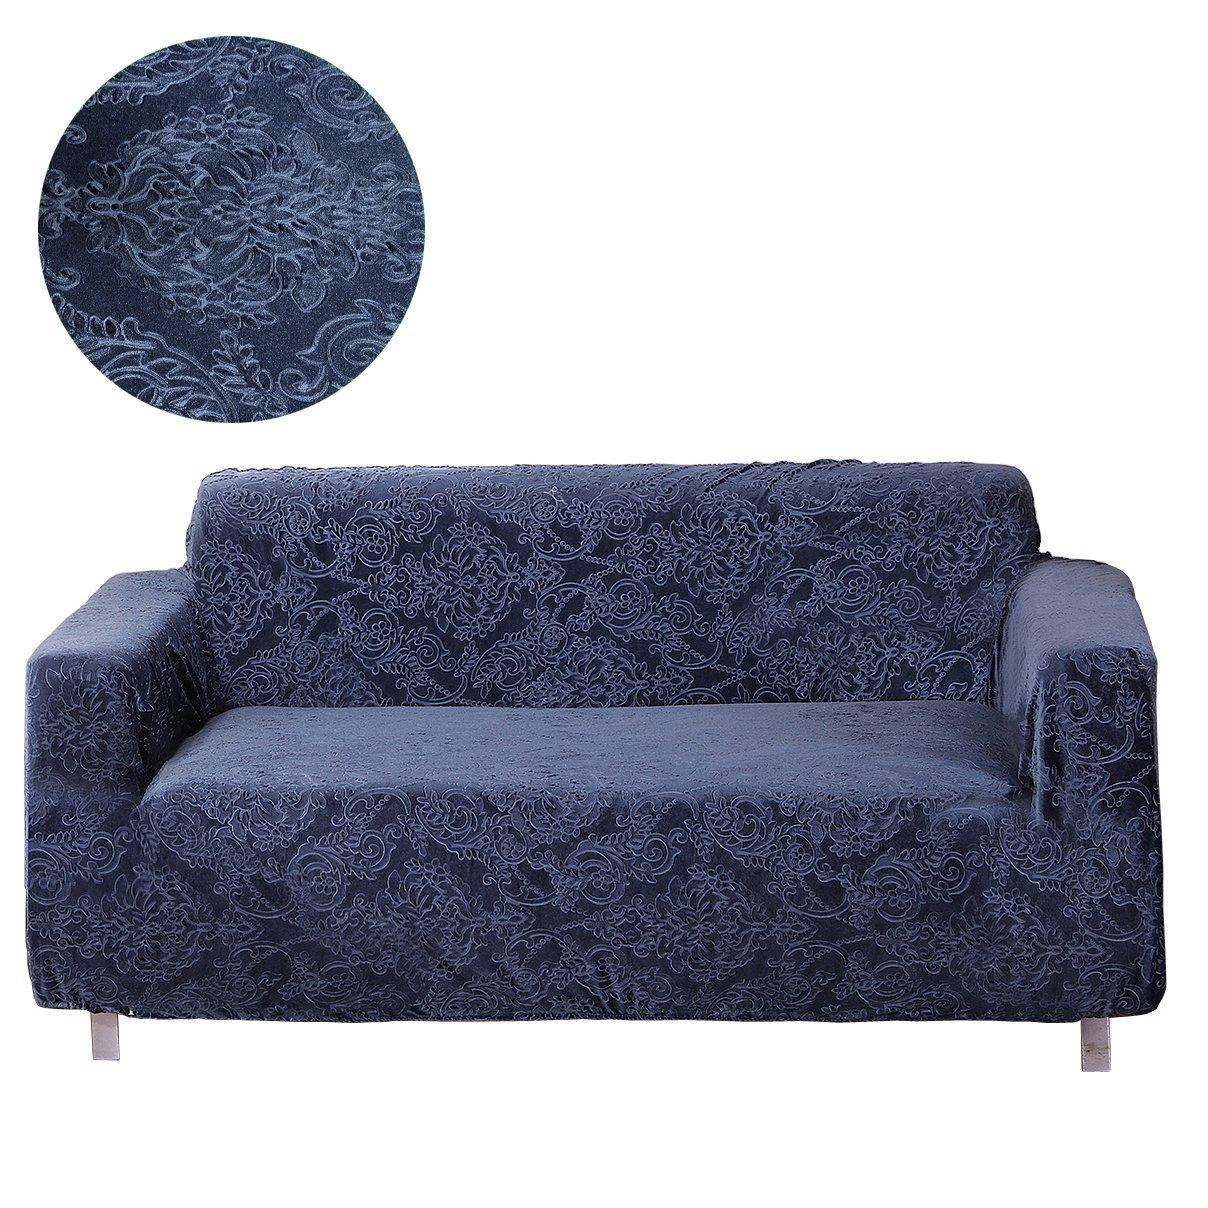 Moving Garden Jacquard Sofa Covers Stretch Elastic Fabric Flower Printing Chari Loveseat Slipco Jmtall